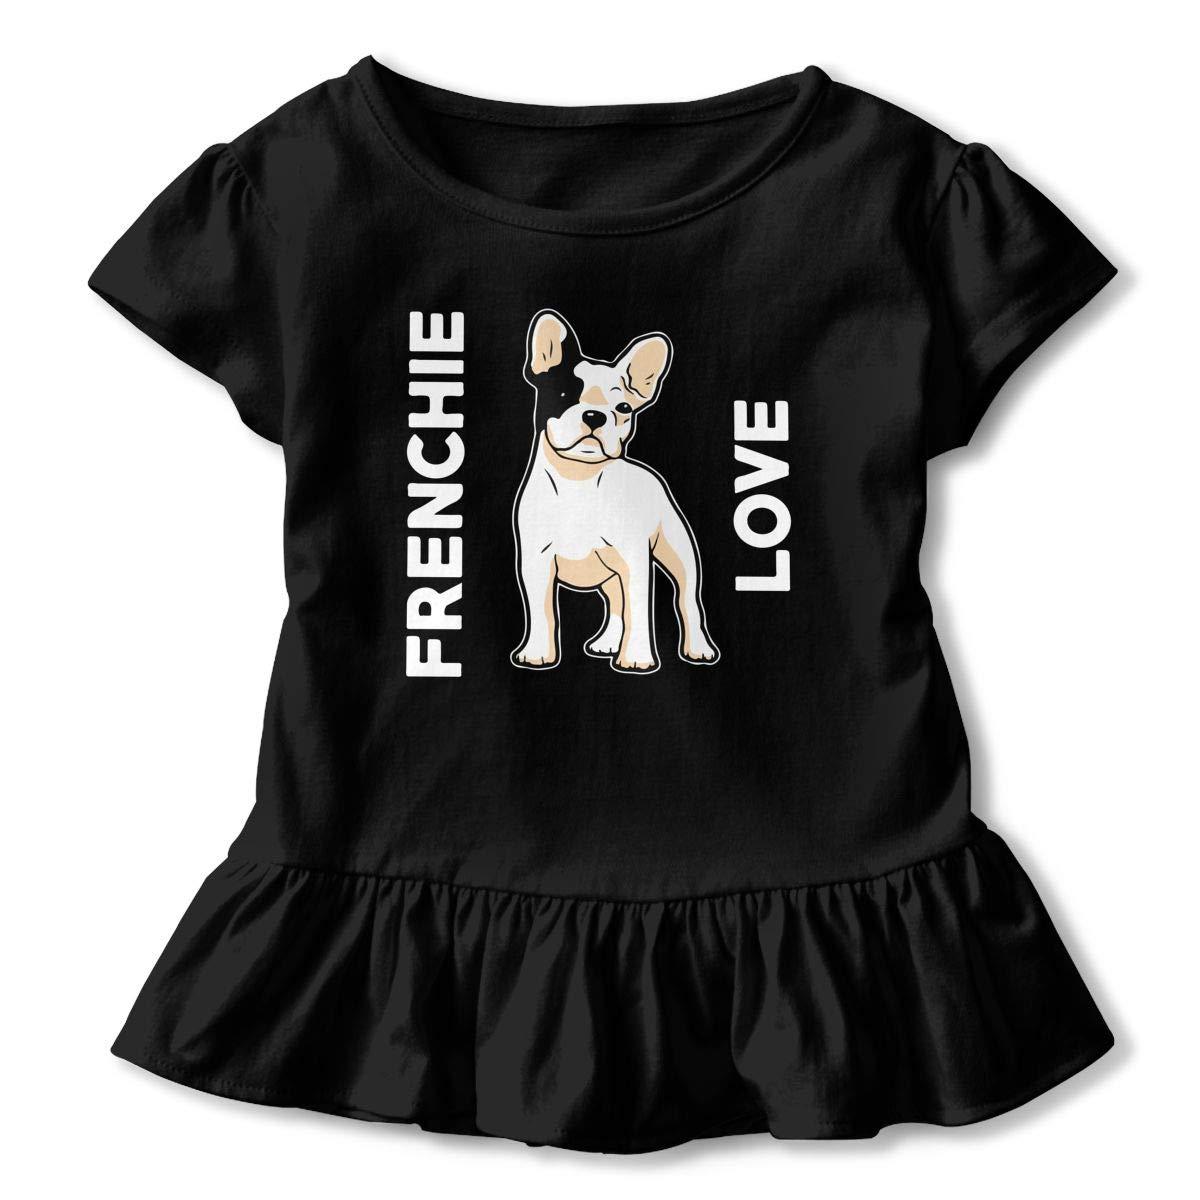 Frenchie Love Cute French Bulldog Toddler Girls T Shirt Kids Cotton Short Sleeve Ruffle Tee